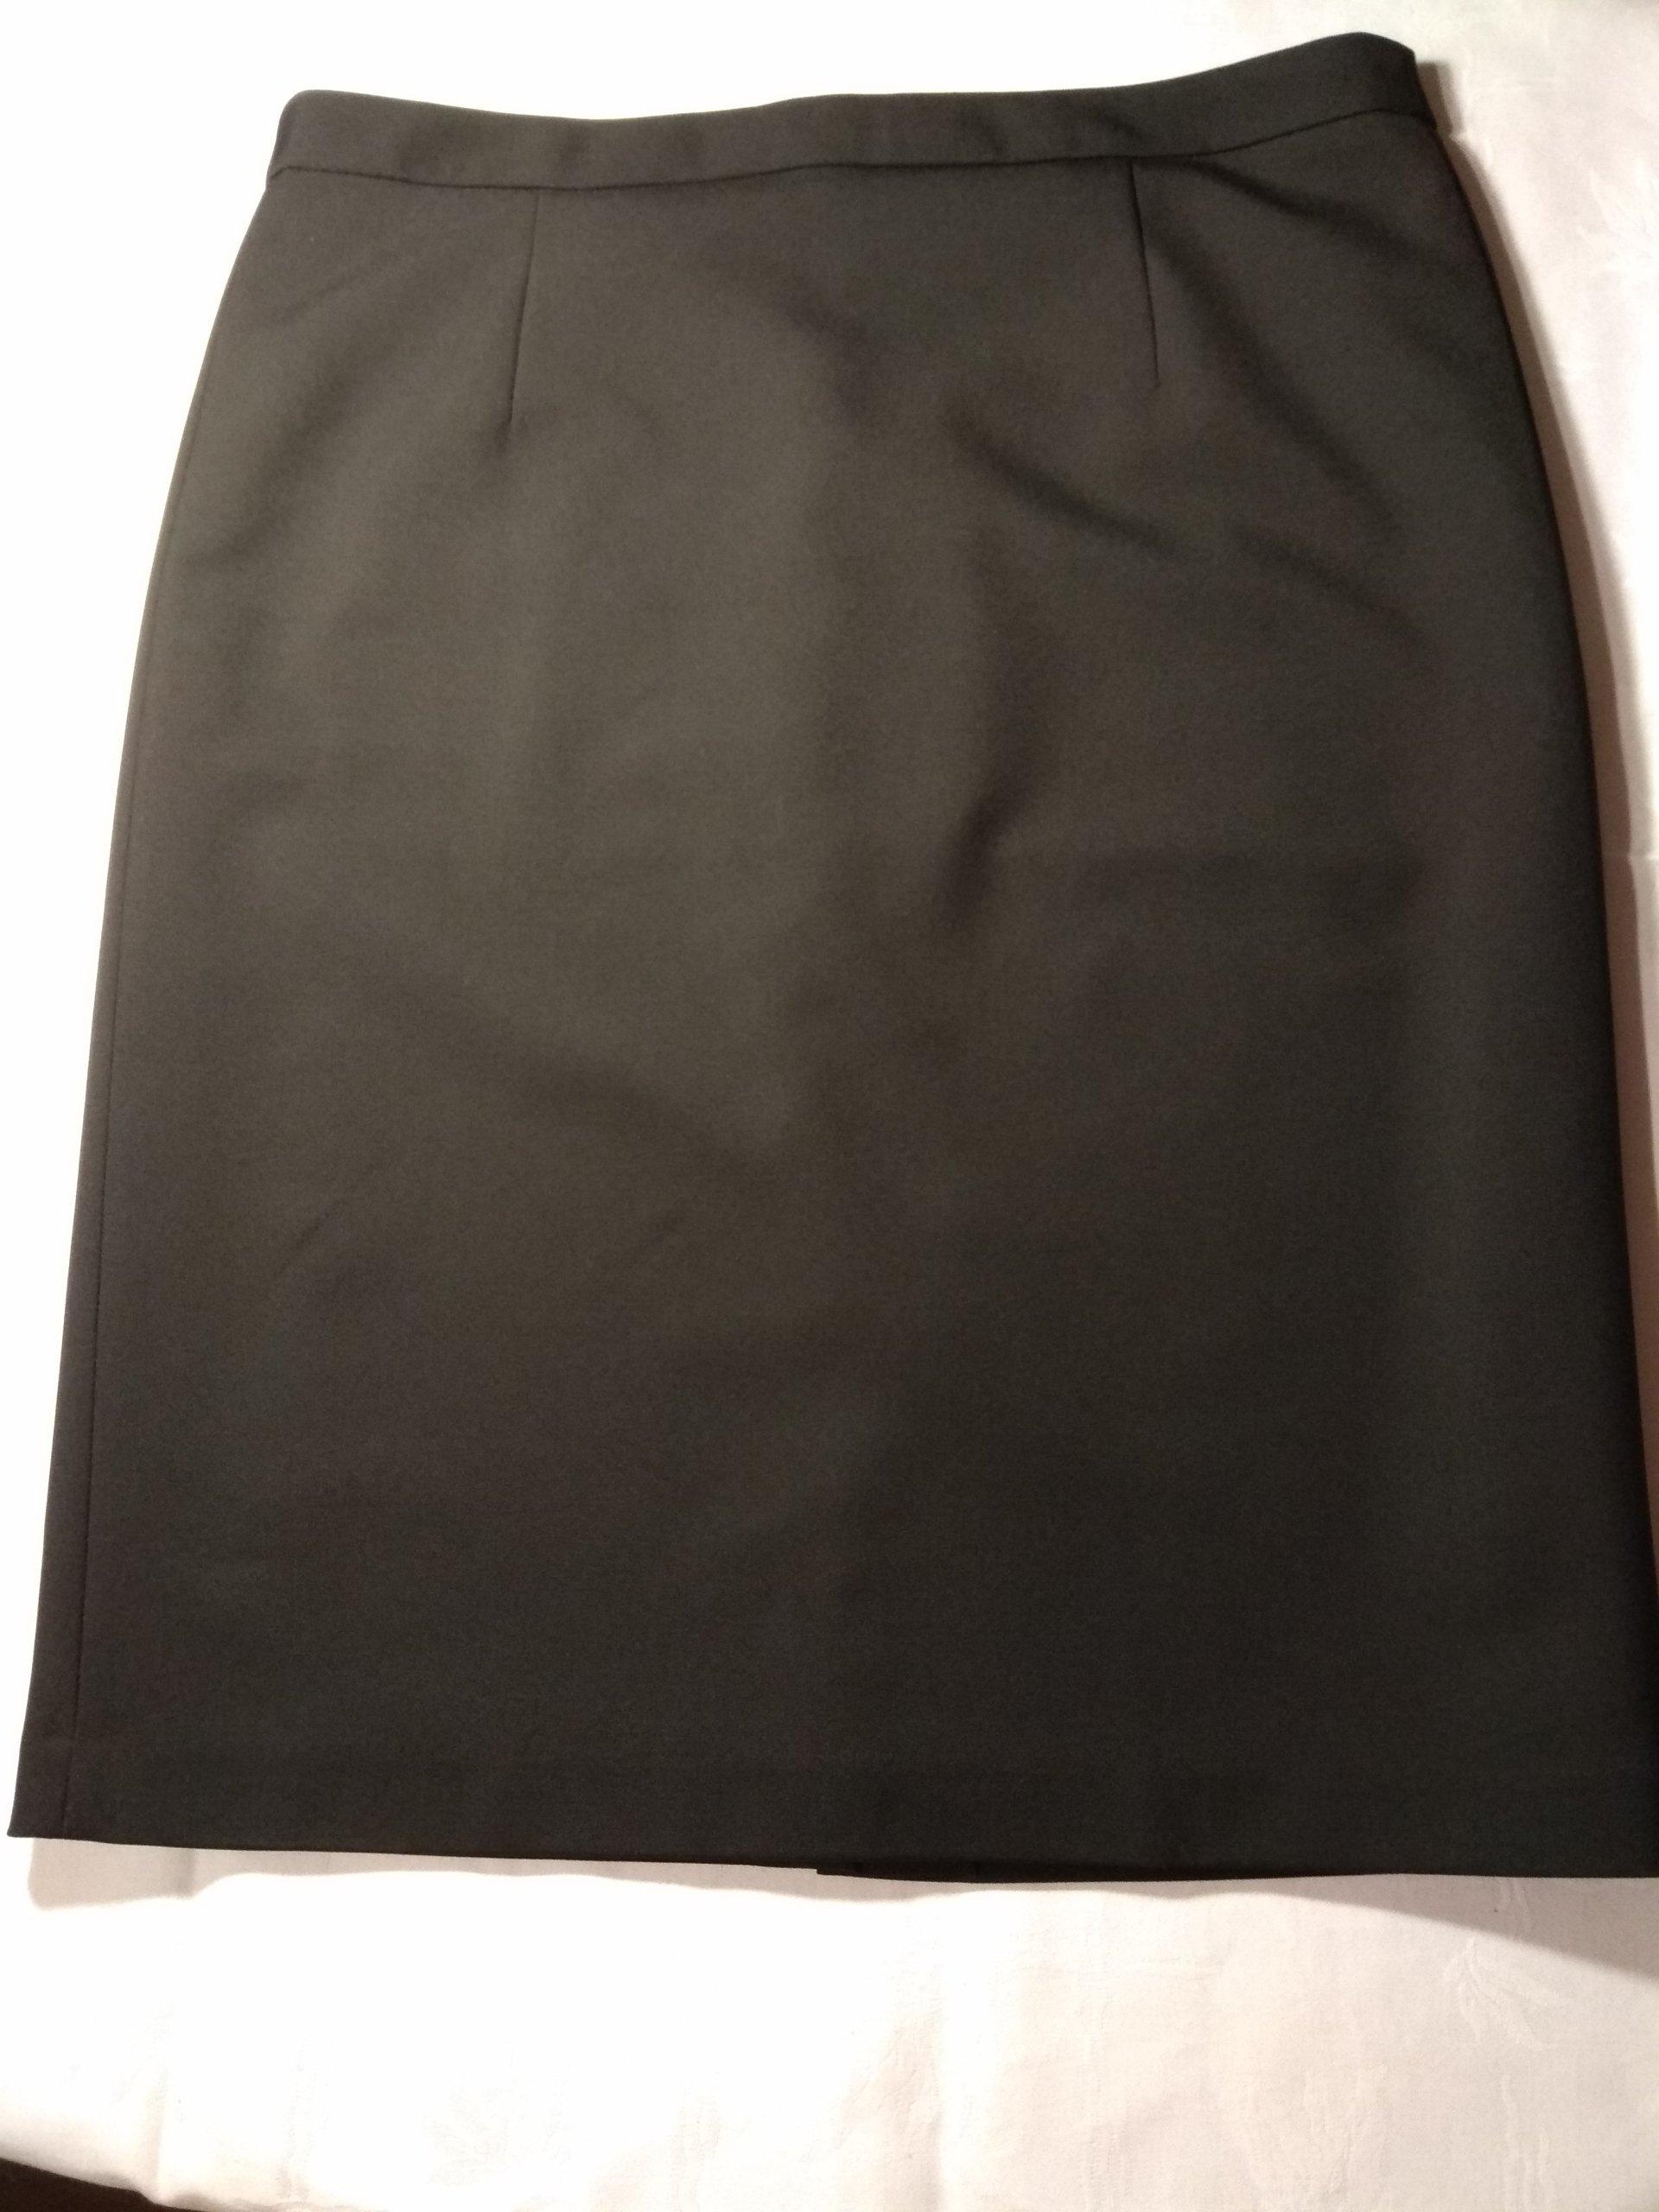 6c2d40c9 Heidi Klum, spódnica damska ołówkowa, czarna. - 7510607691 ...